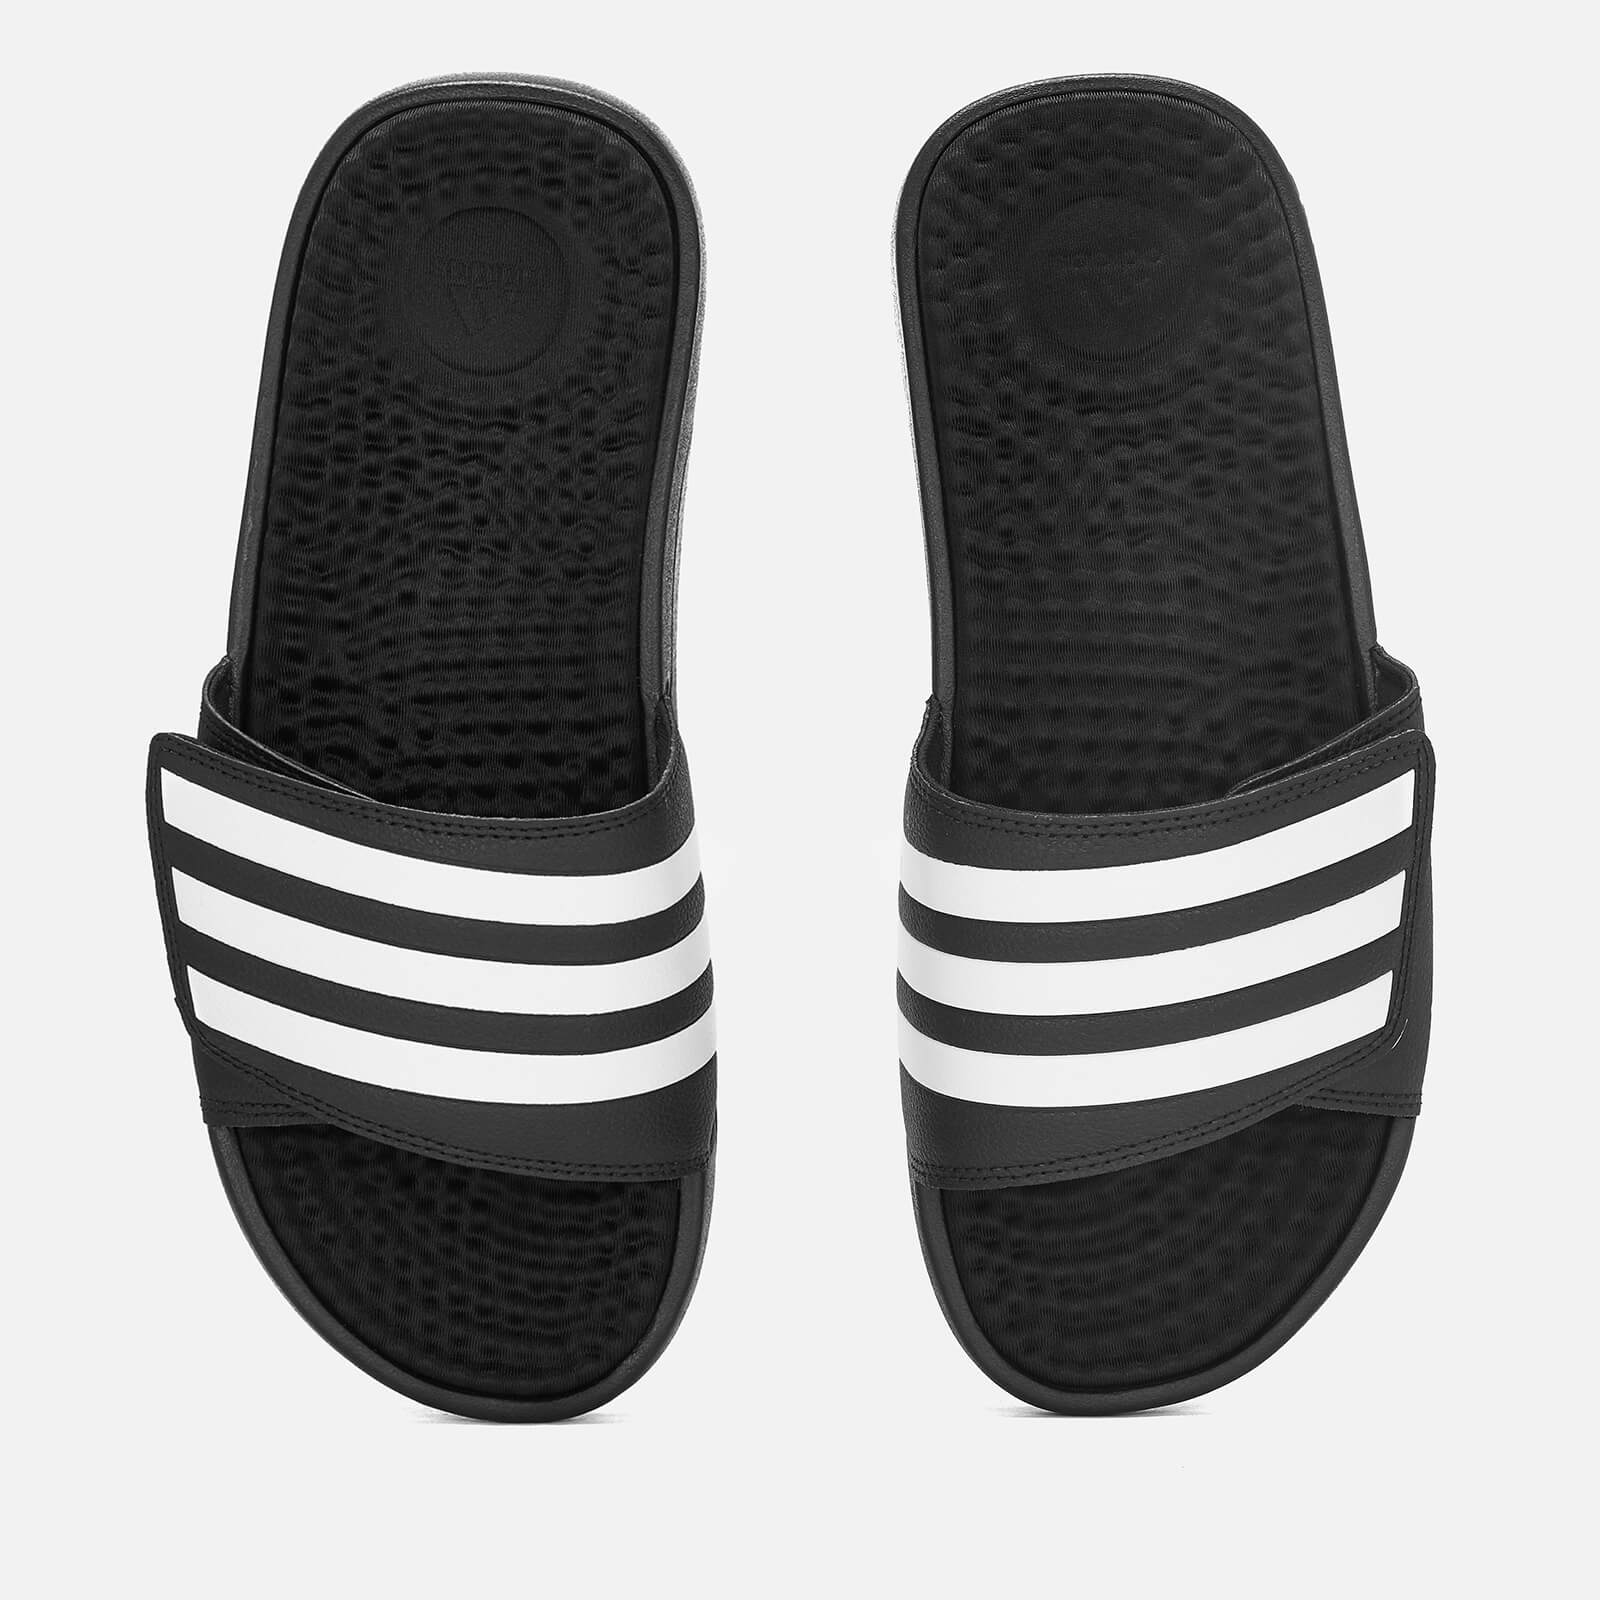 9102f0fd4b998 adidas Men s Adissage TND Slide Sandals - Black Sports   Leisure ...